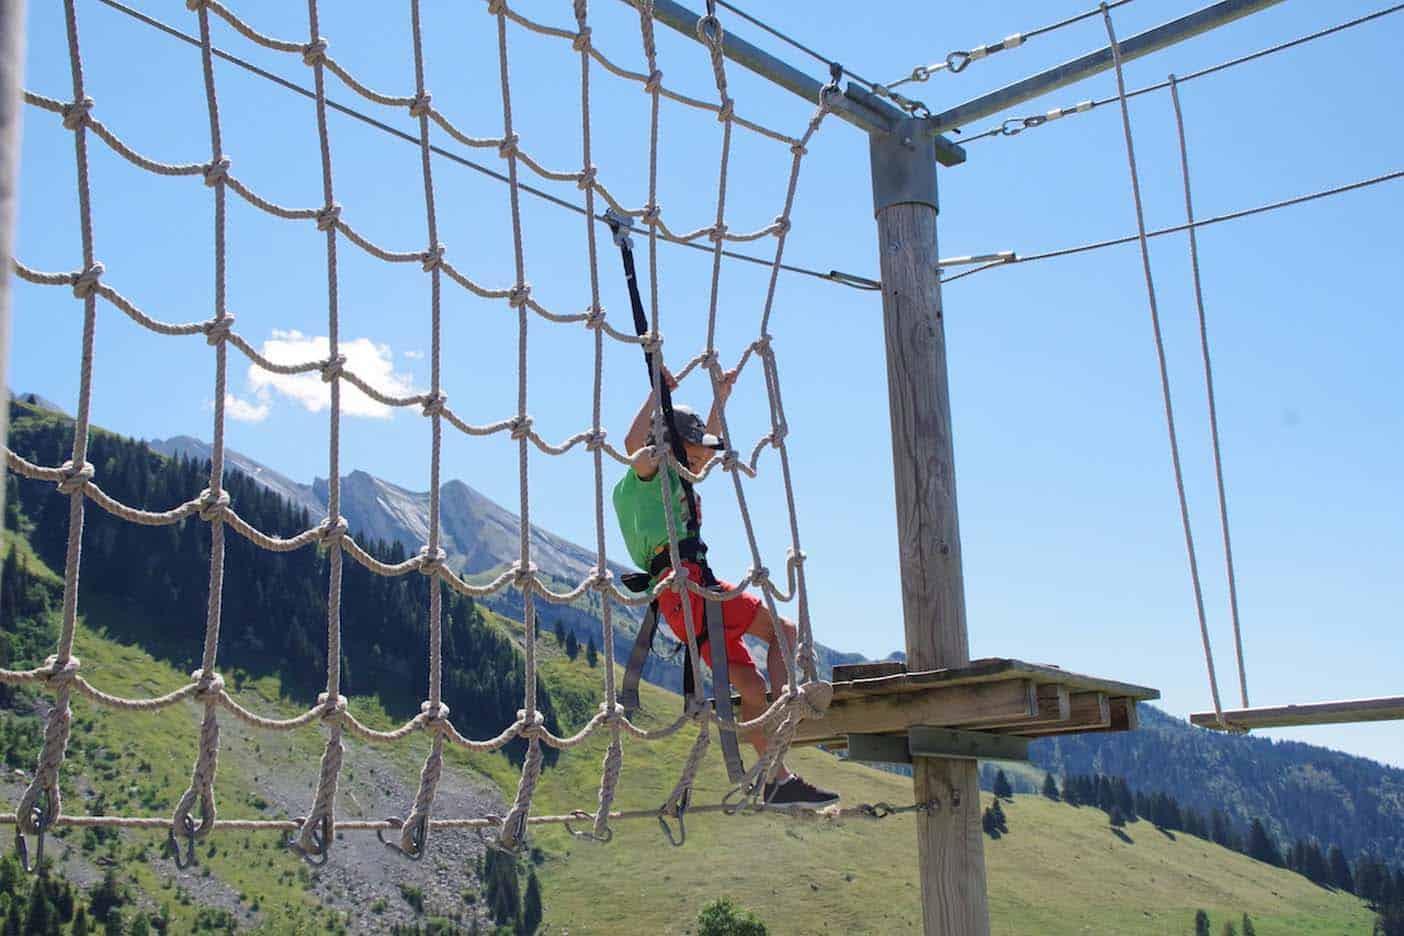 La clusaz zomer franse alpen zipline